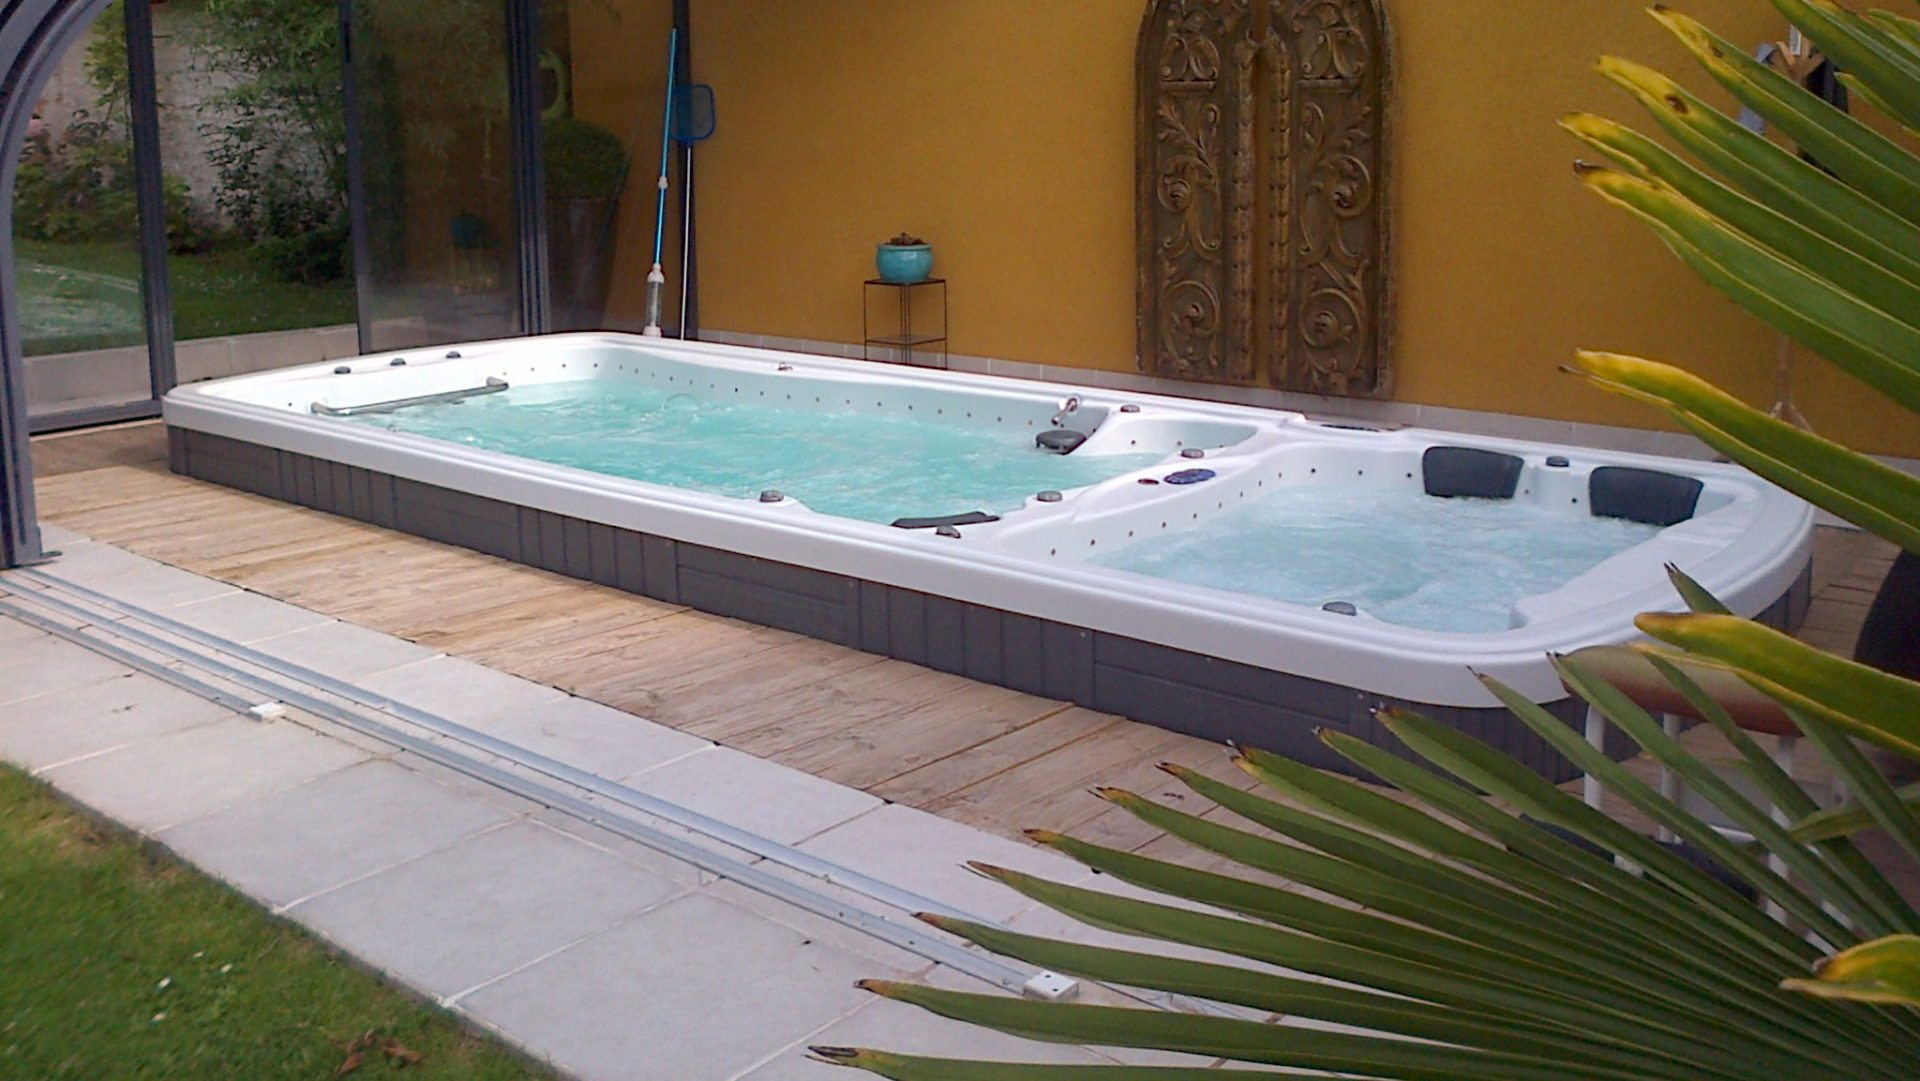 blue lagoon spas fabricant de spas spas de nage id es piscine. Black Bedroom Furniture Sets. Home Design Ideas